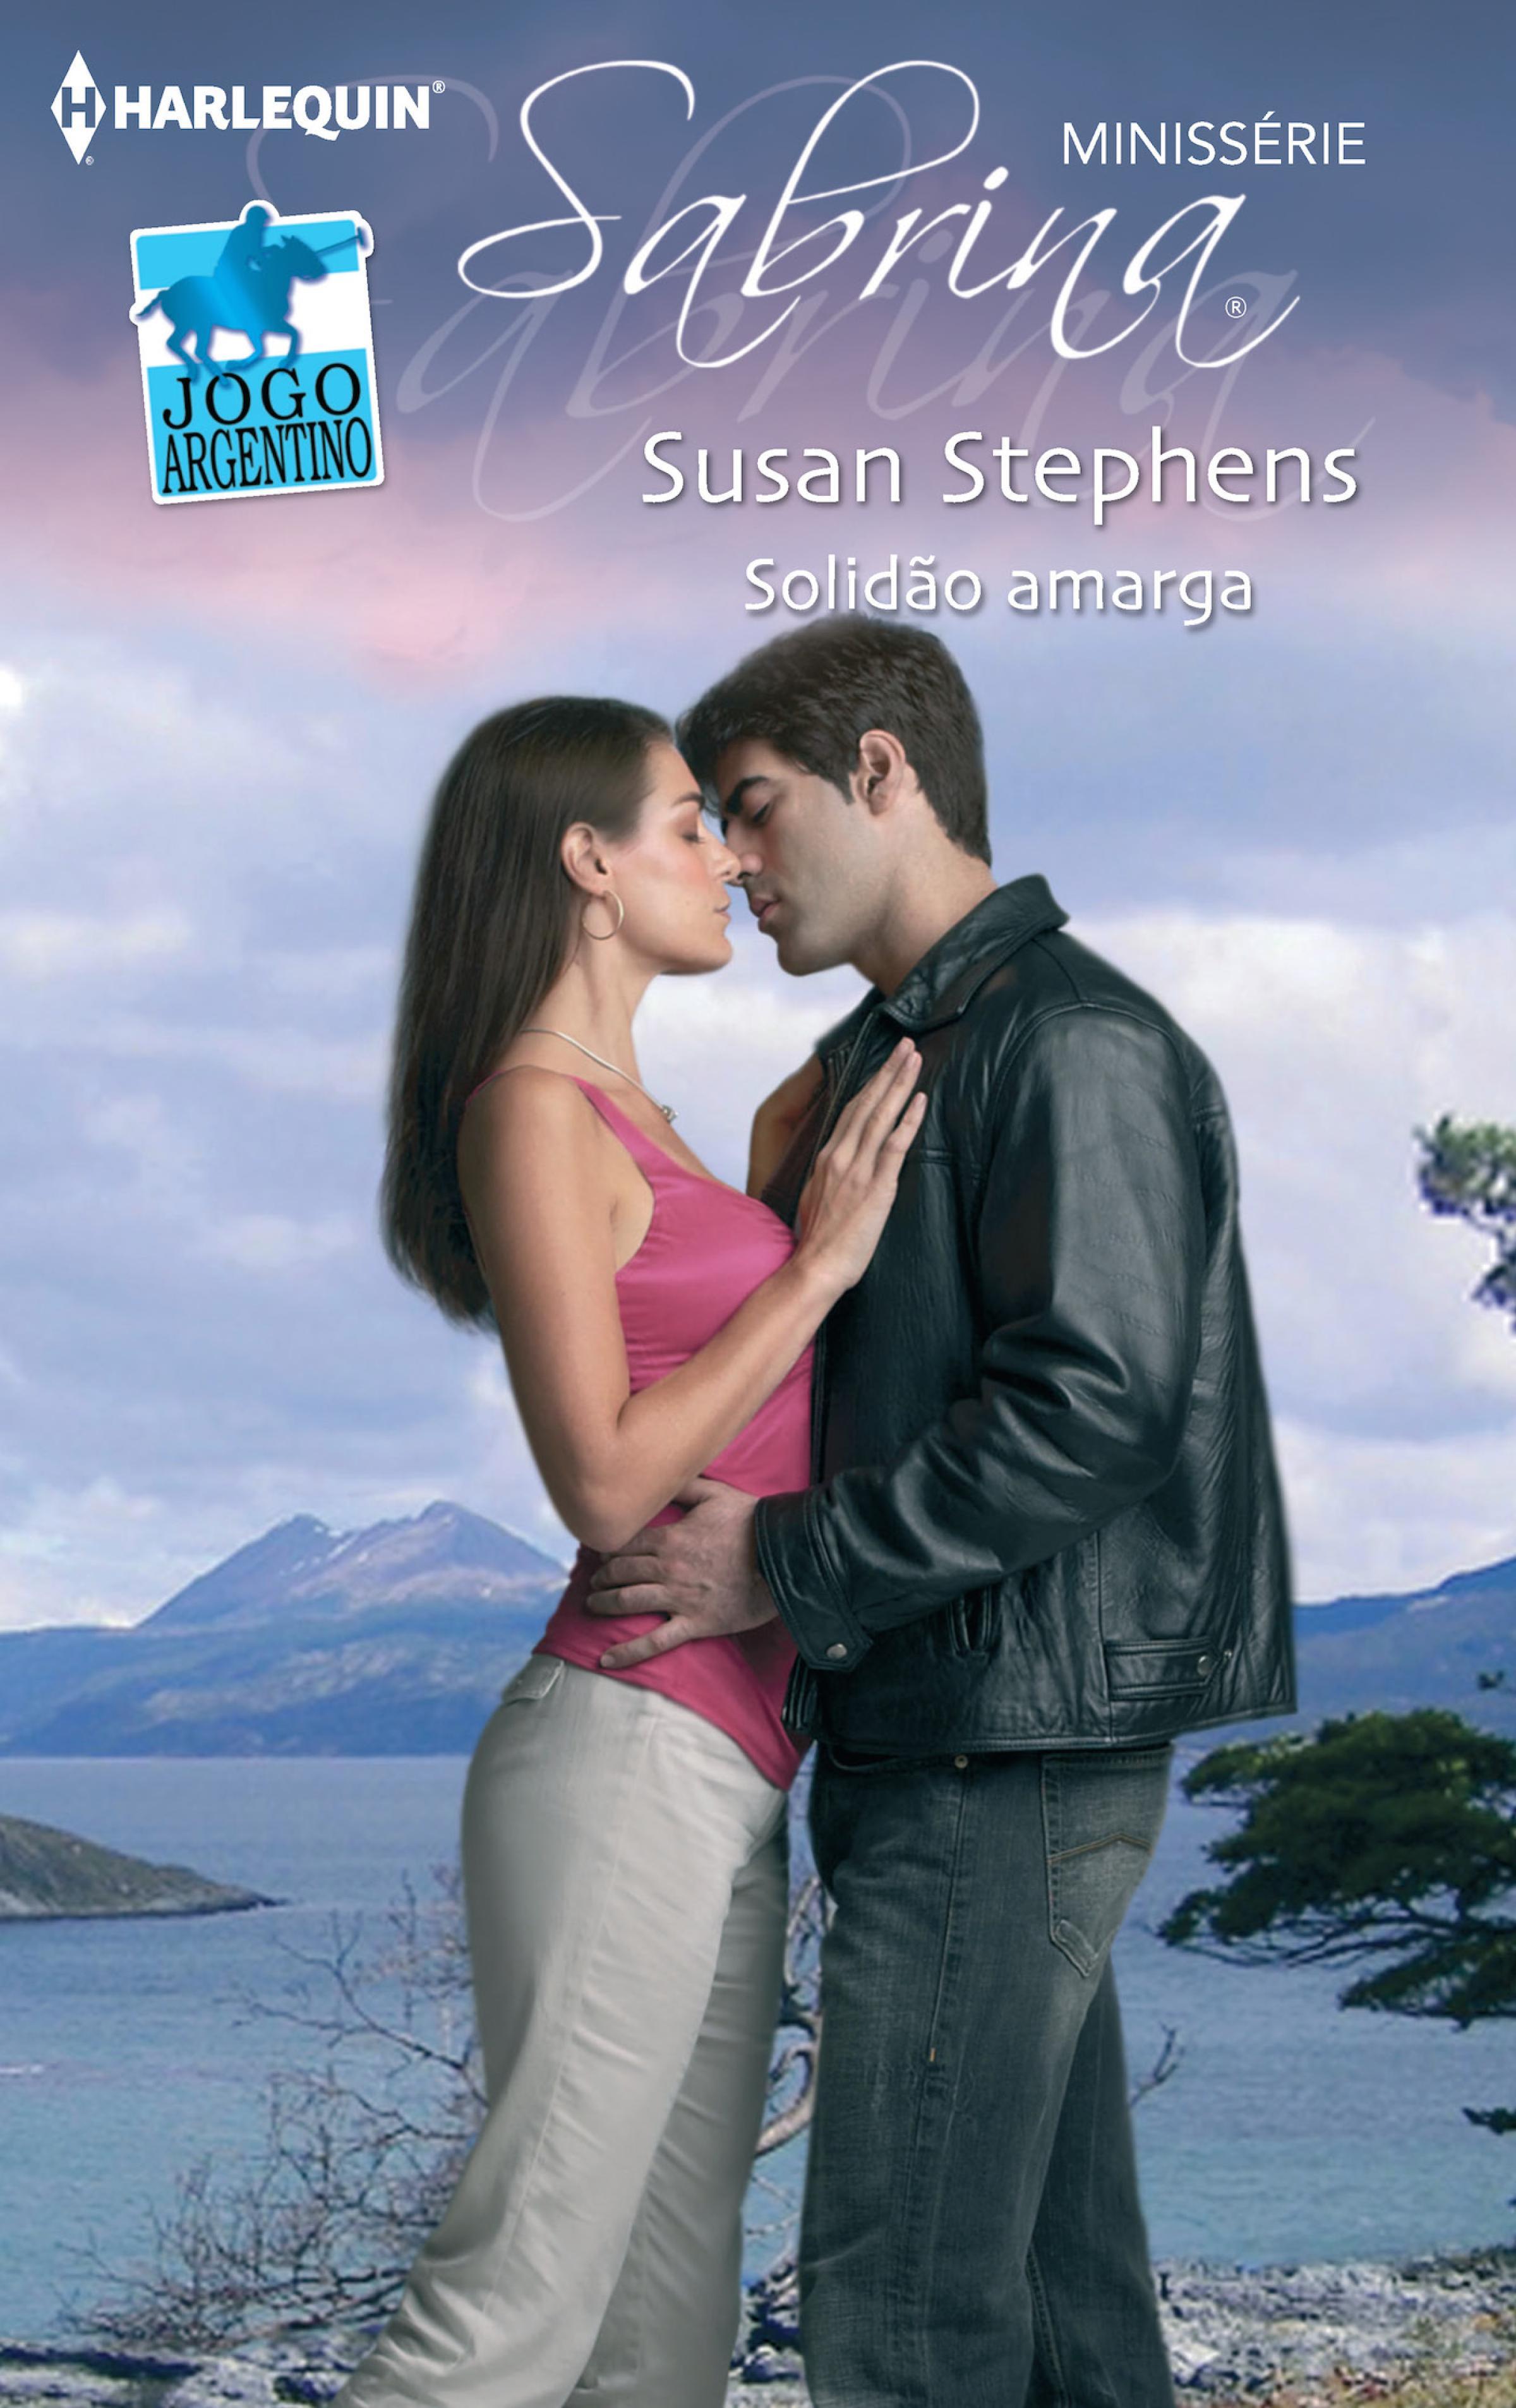 Susan Stephens Solidão amarga susan stephens the flaw in his diamond